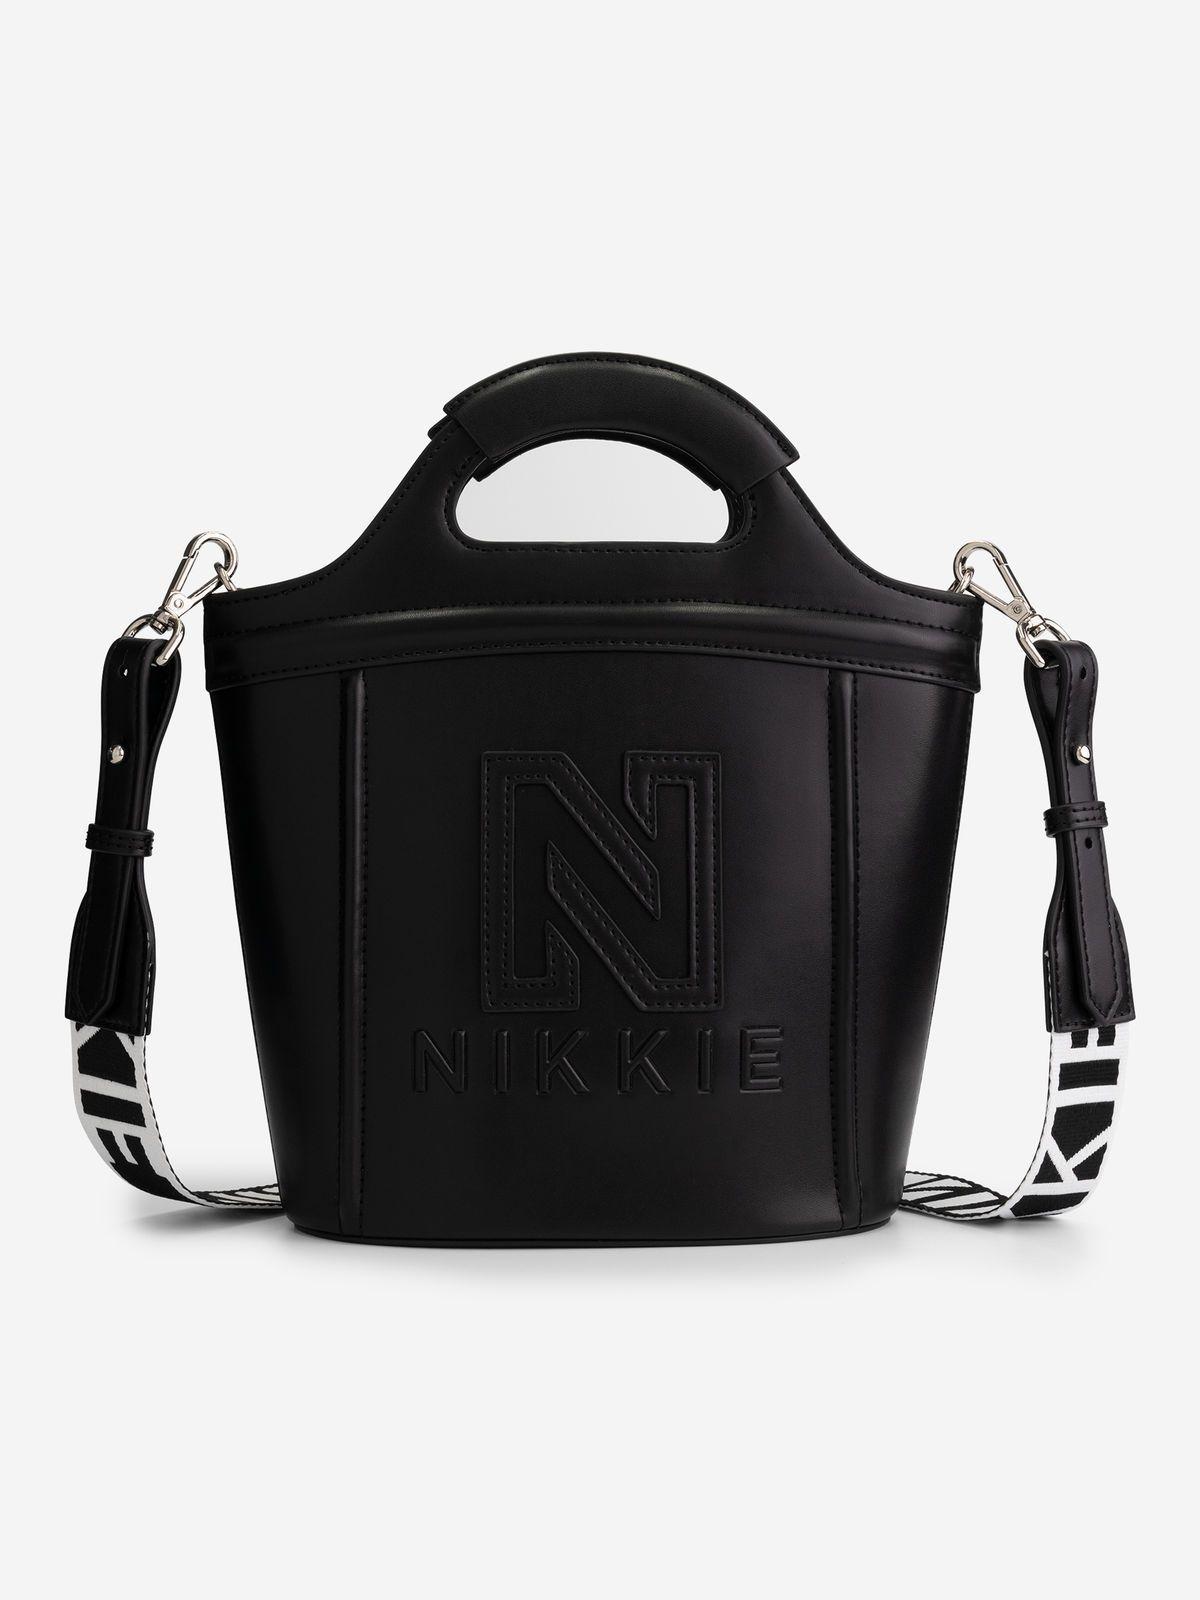 NIKKIE  POLLY RUBER BAG BLACK